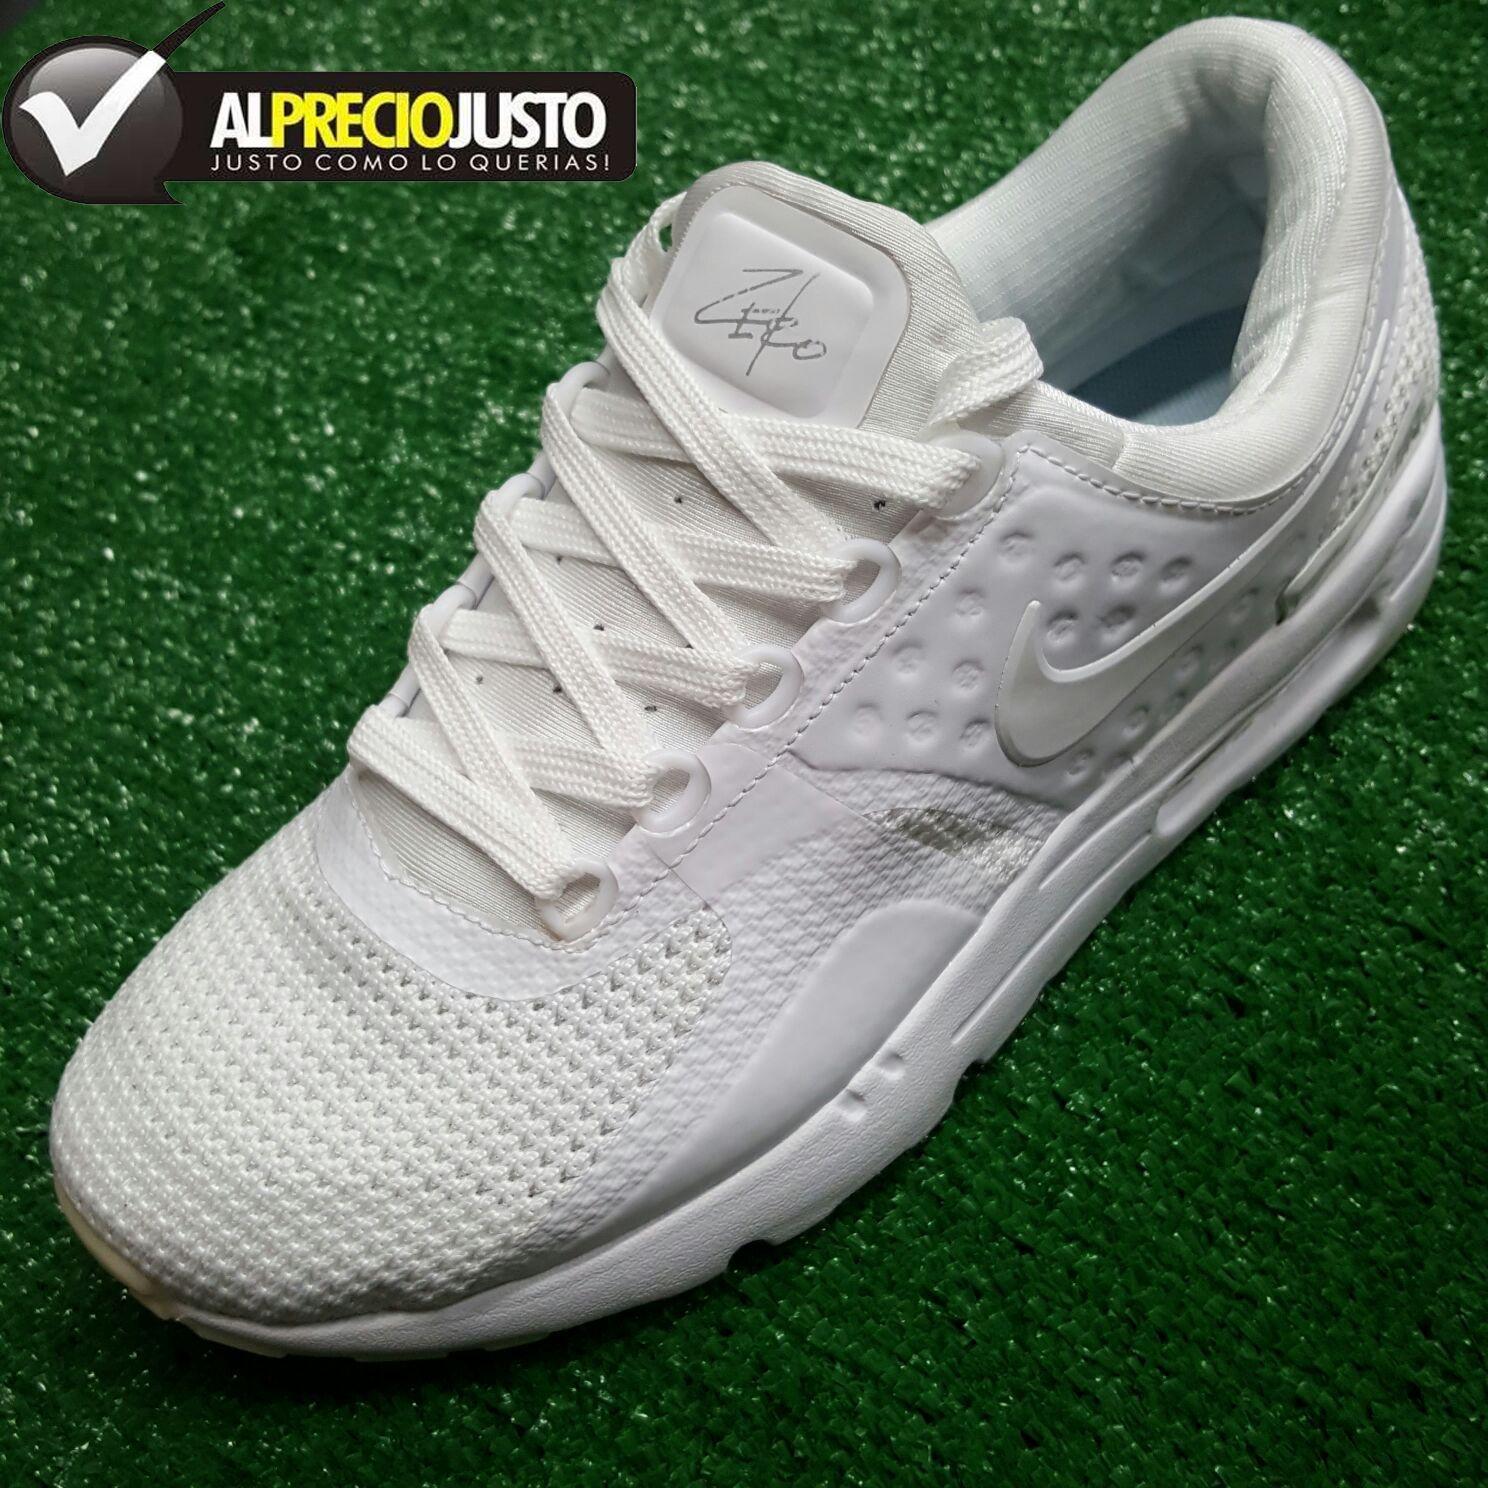 Tenis Nike Air Max Zero $145.000 Envios gratis Pedidos via